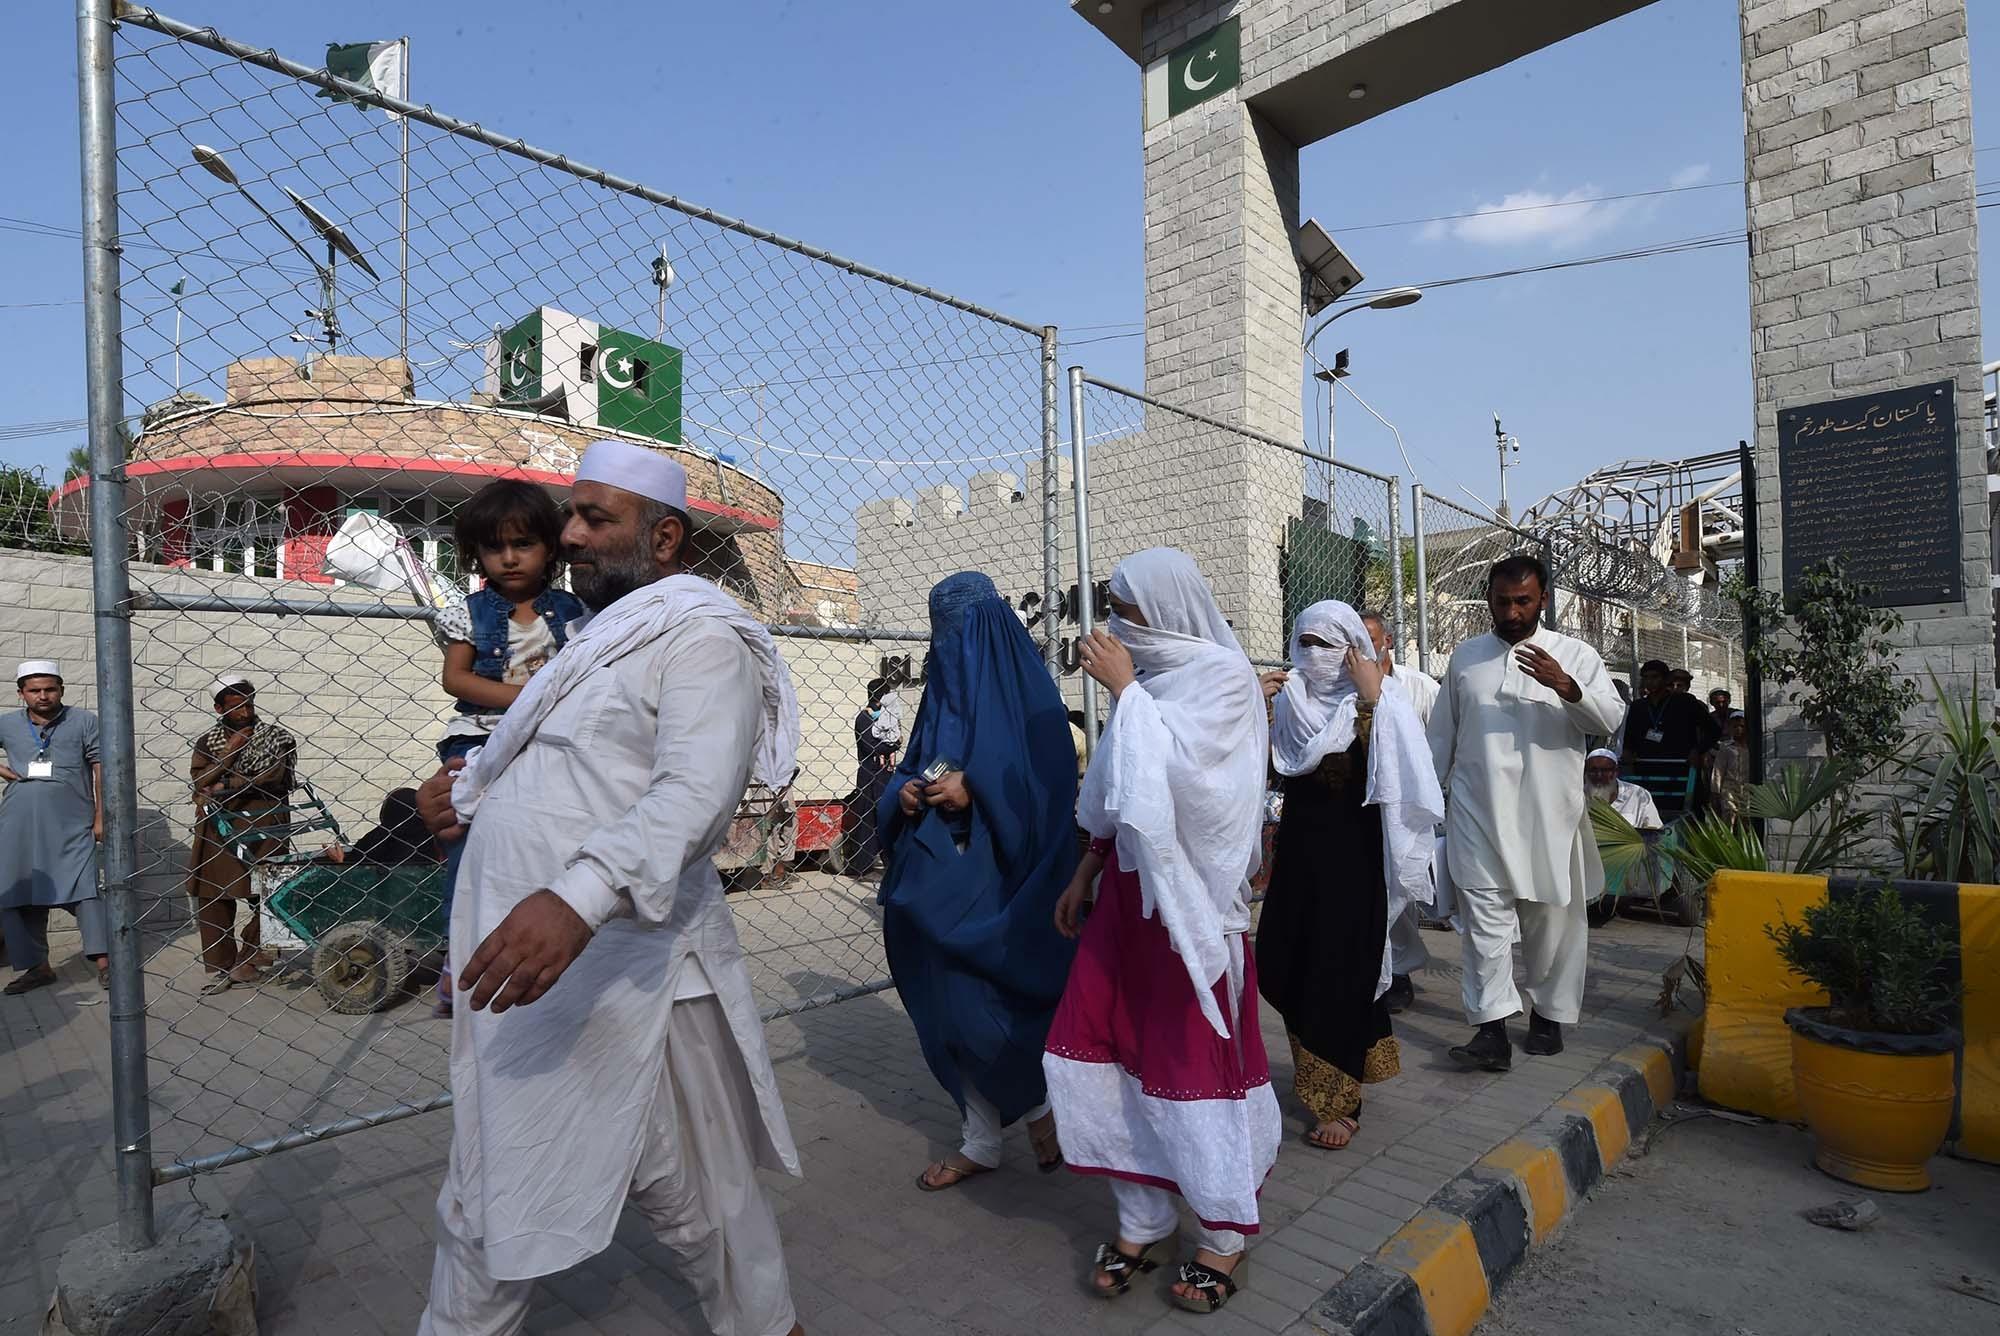 Pakistan, Afghanistan must enhance border security: report